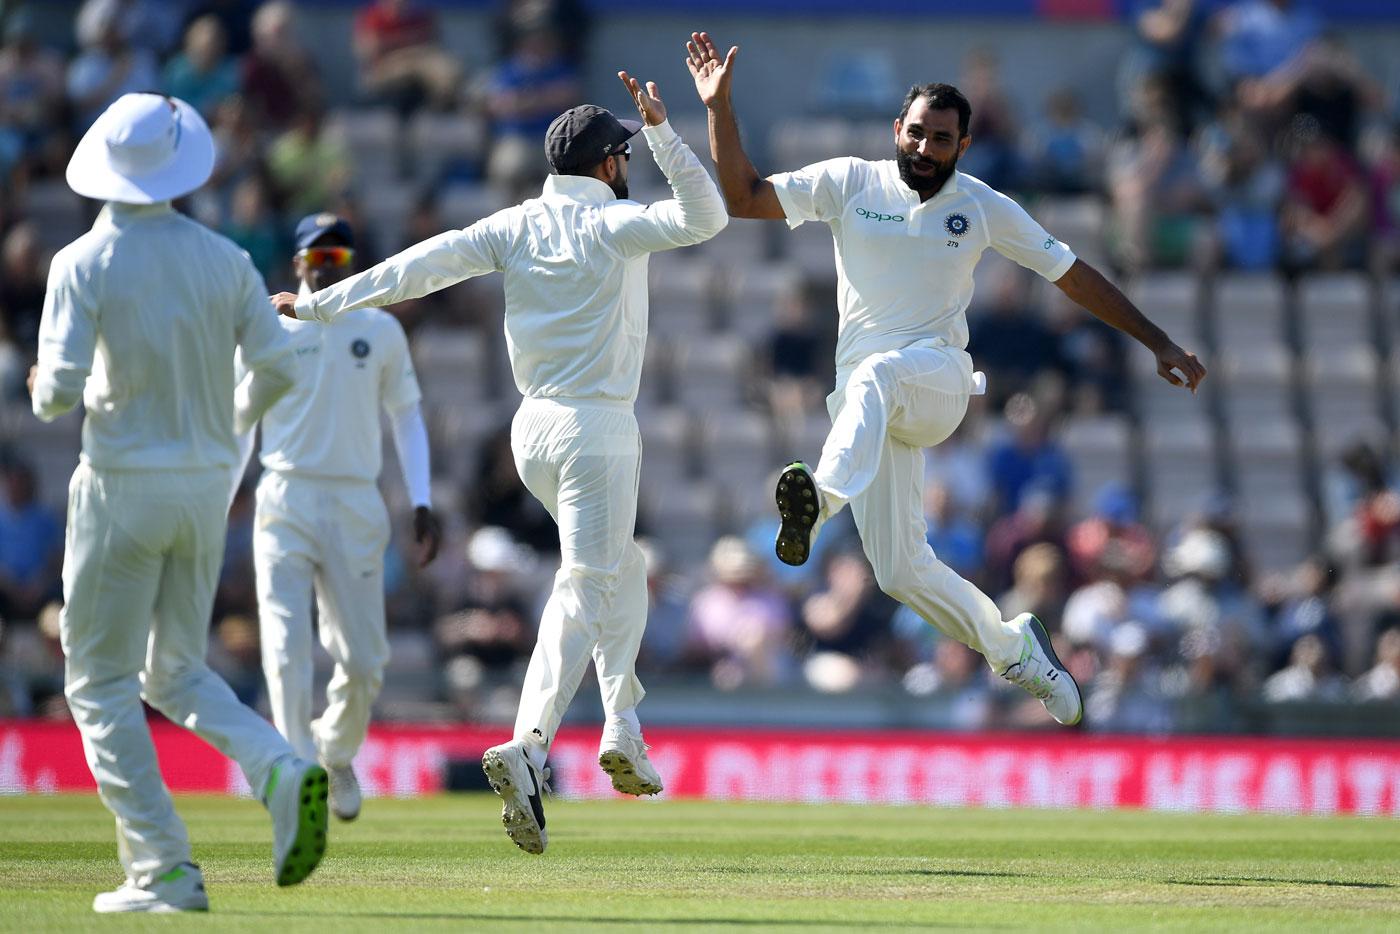 ENG vs IND 2018: Anshuman Gaekwad Criticises Bowlers After Southampton Loss